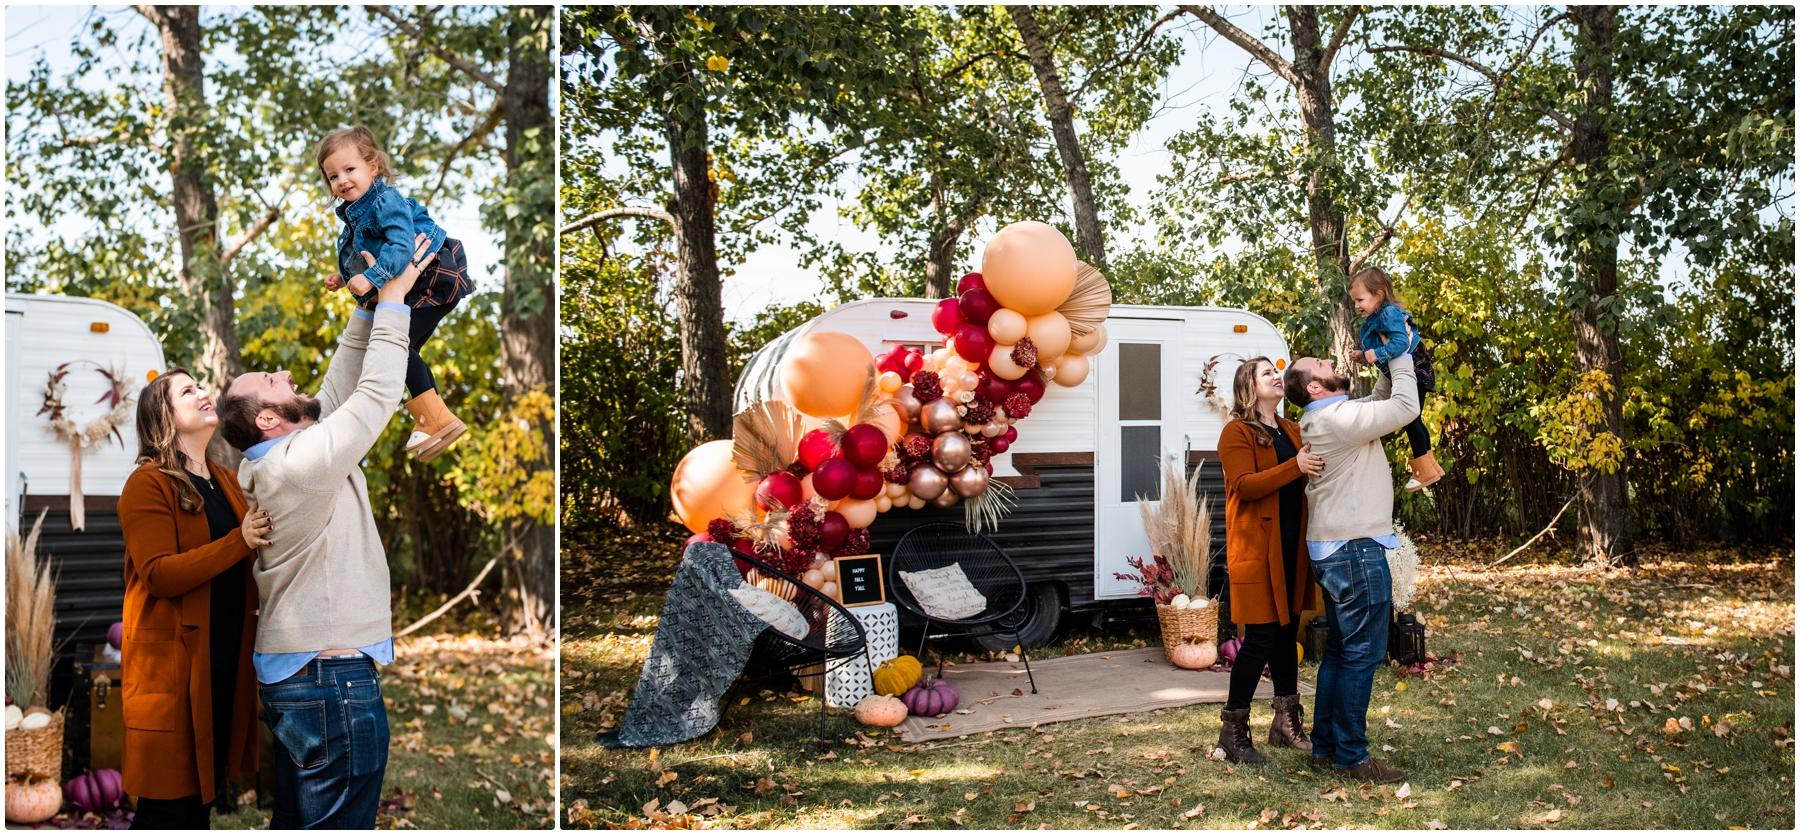 Calgary Mini Session Photography - Autumn Happy Camper